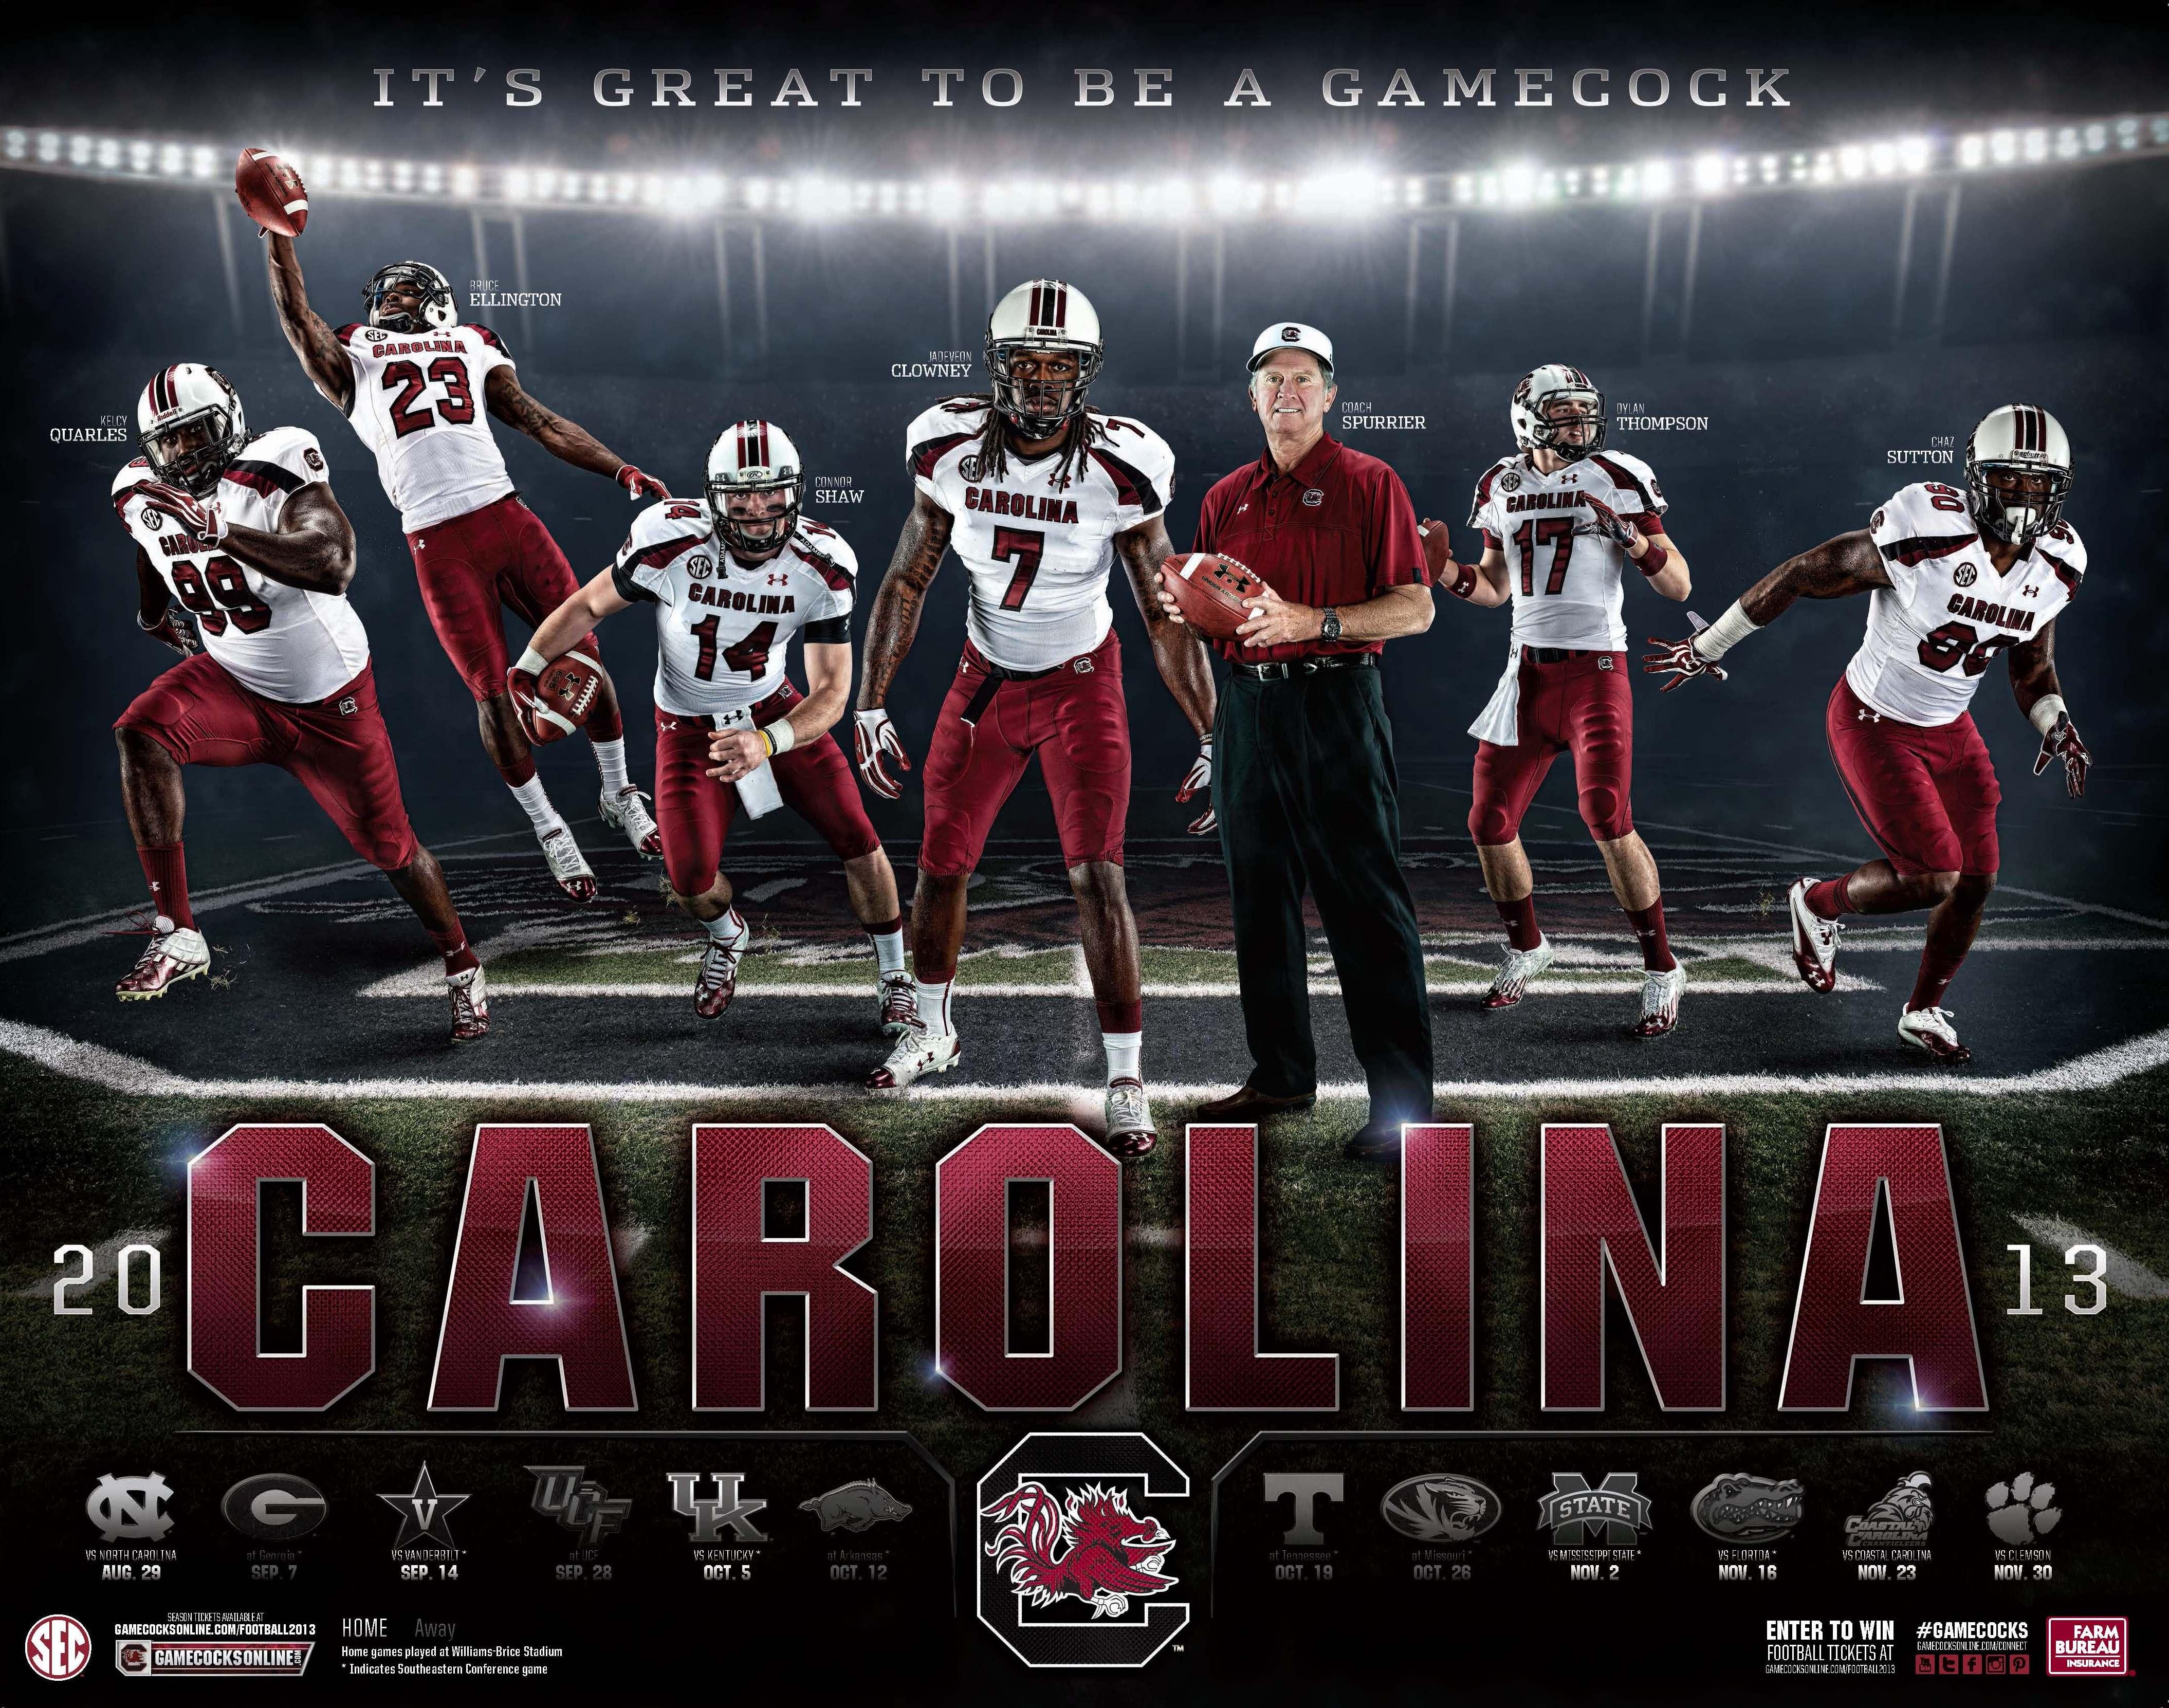 2013 14 South Carolina Desktop Wallpaper 4220x3323